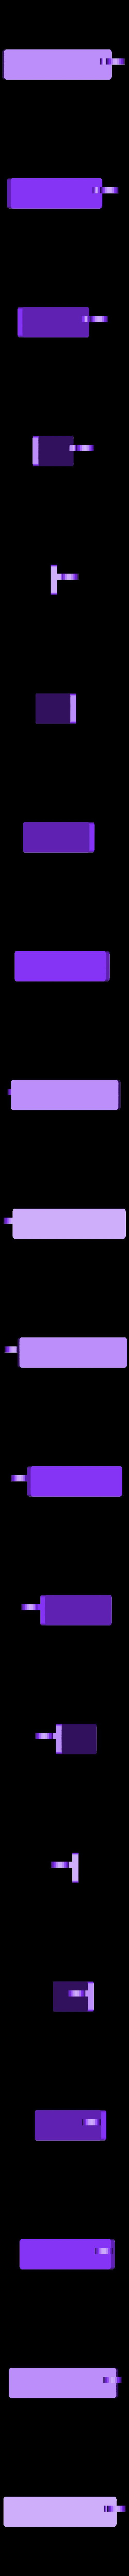 stativ-leg-front.stl Download free STL file Tiny Tripod • 3D printable object, noctaro